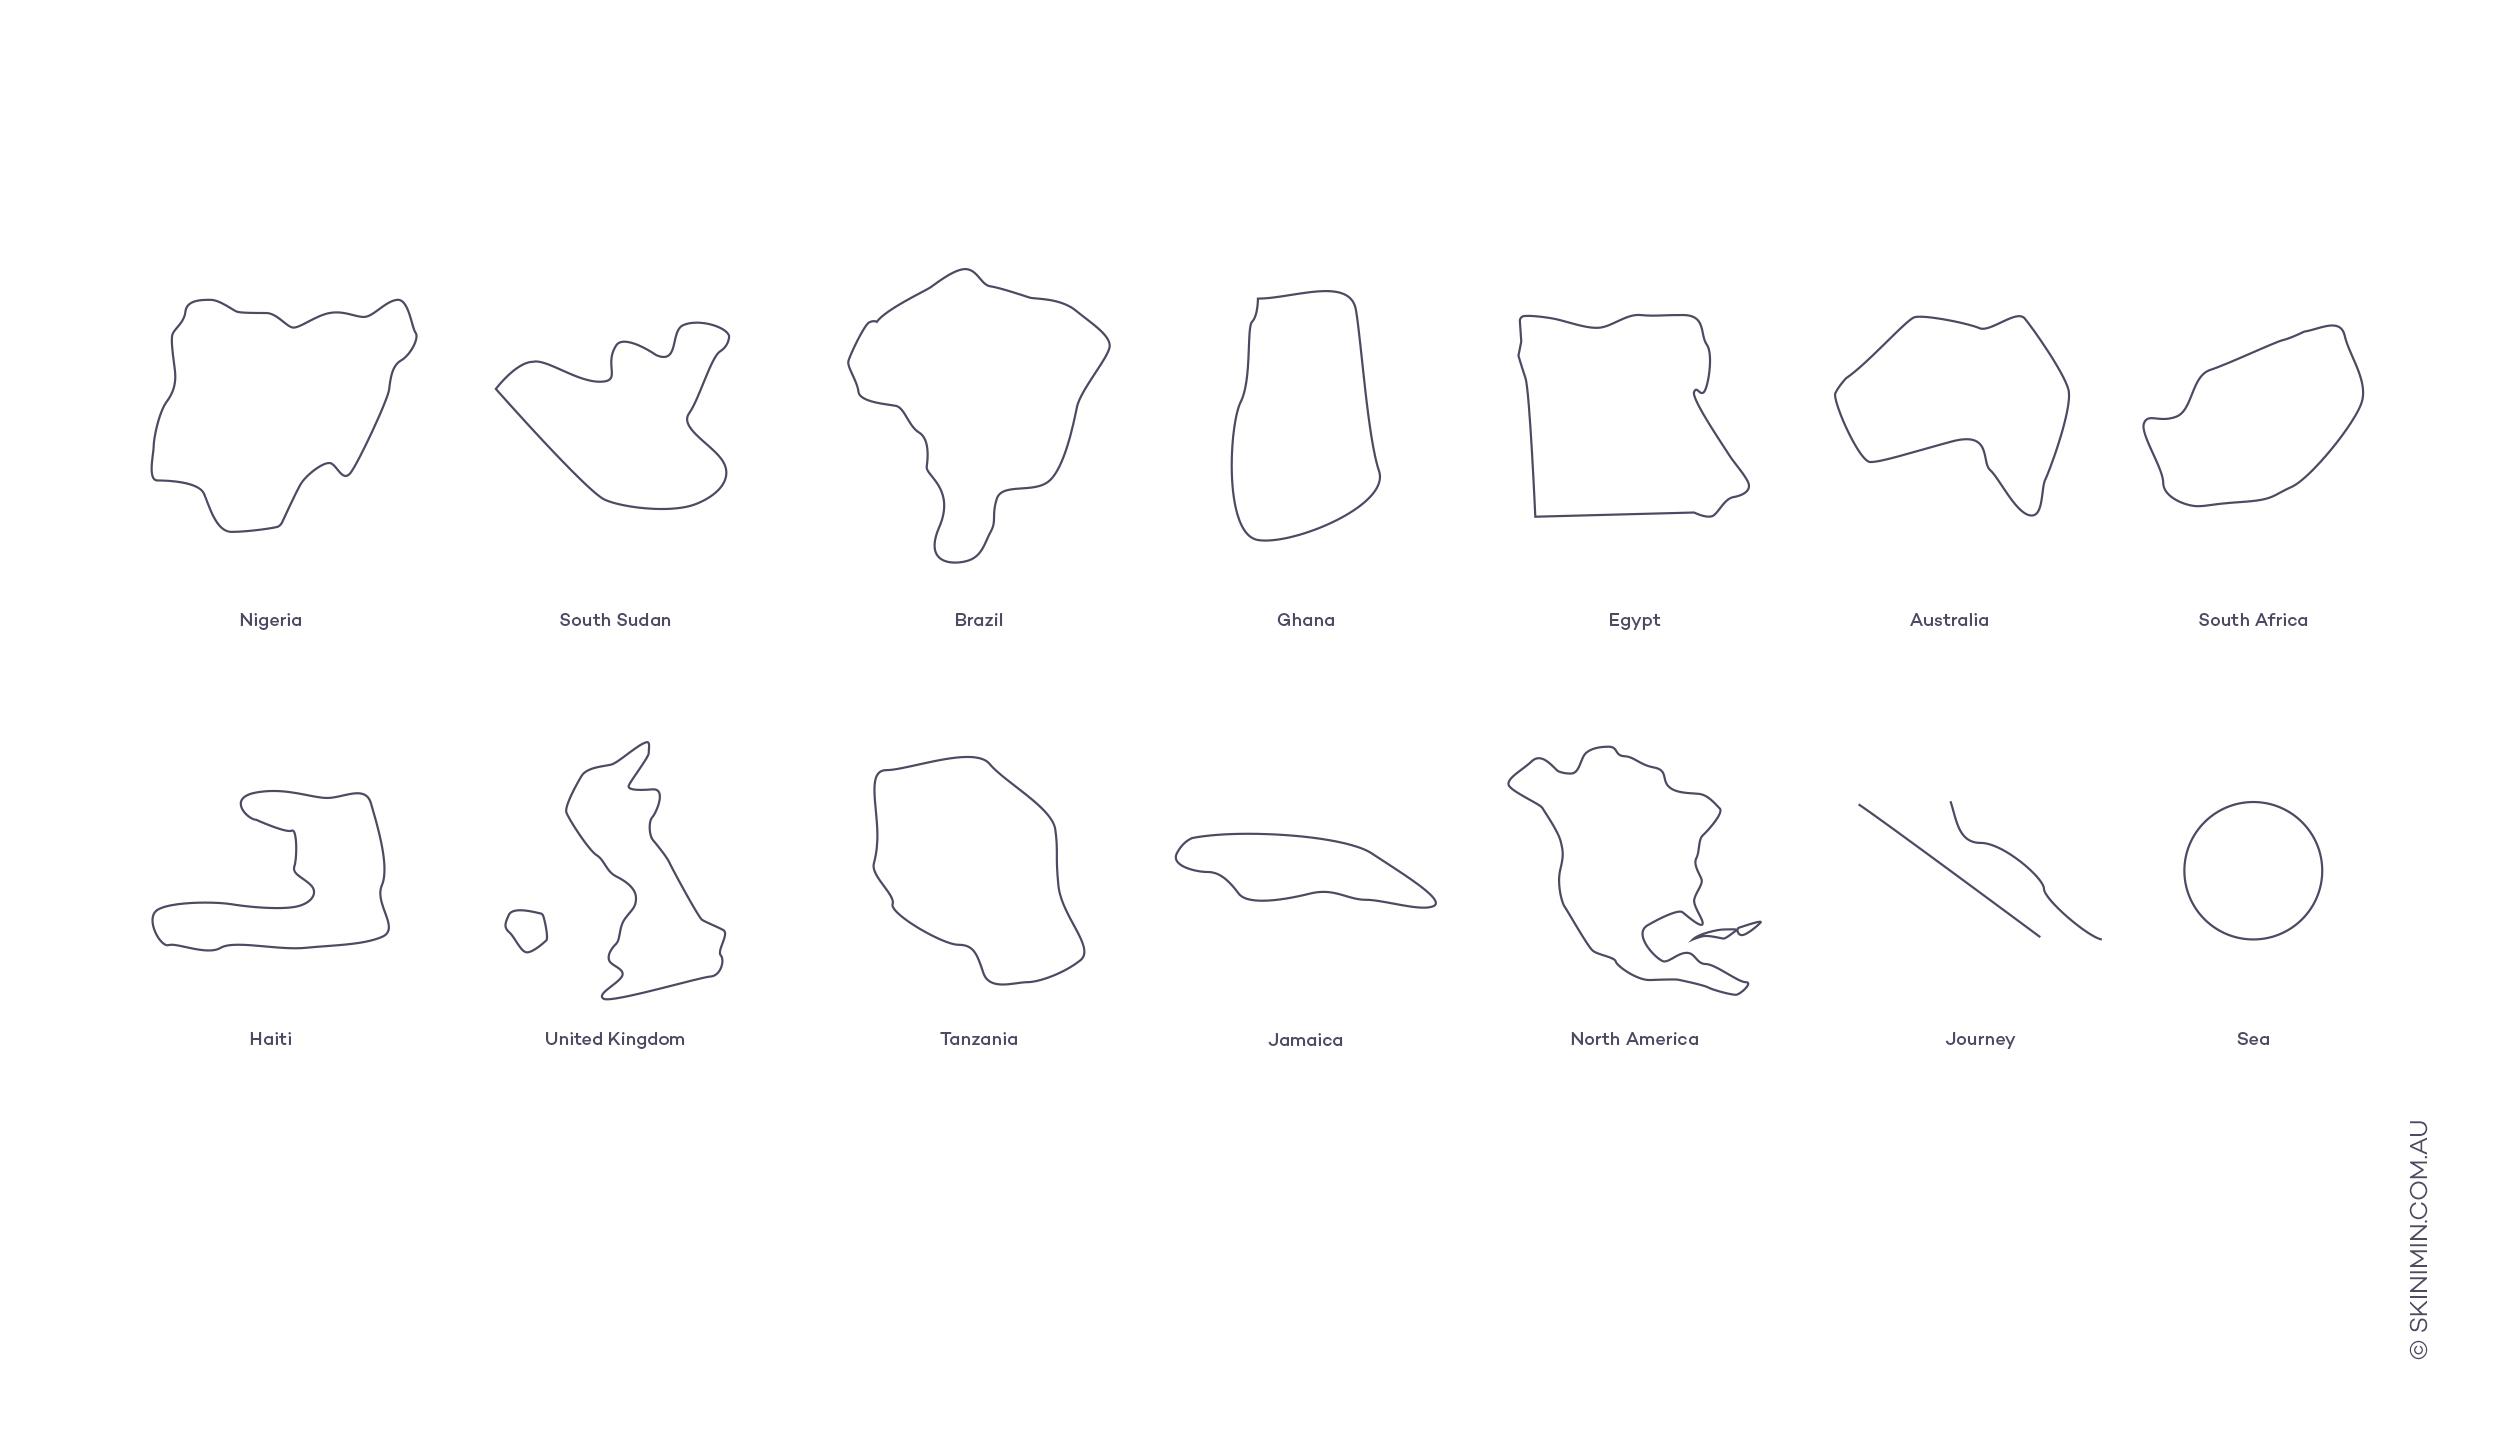 SkinImIn-gala-illustration-countries-2500x1667.jpg